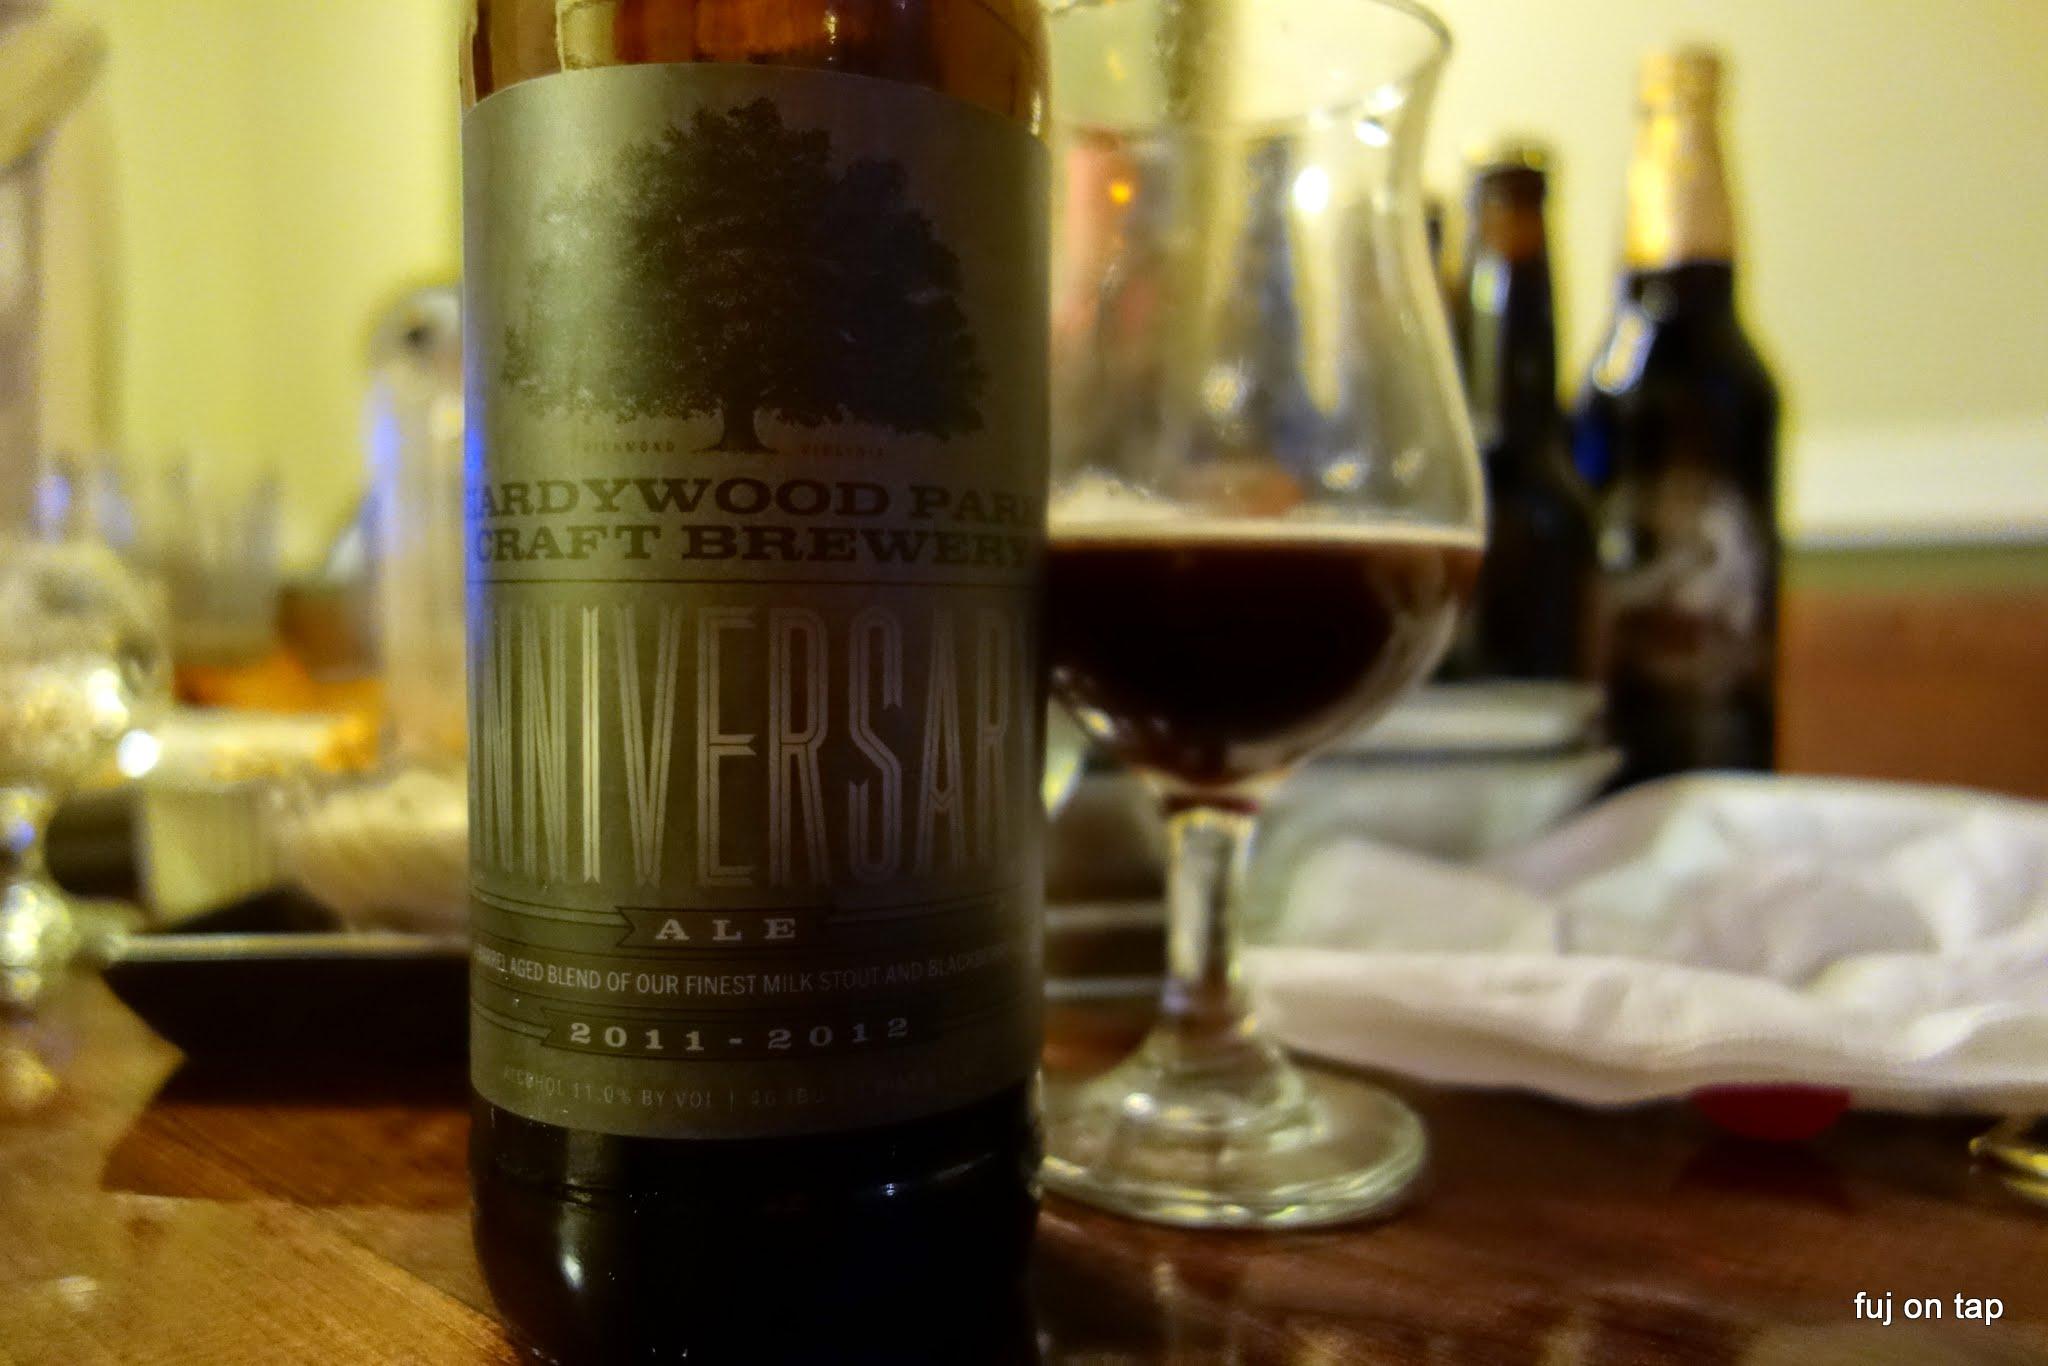 Hardywood Anniversary Ale